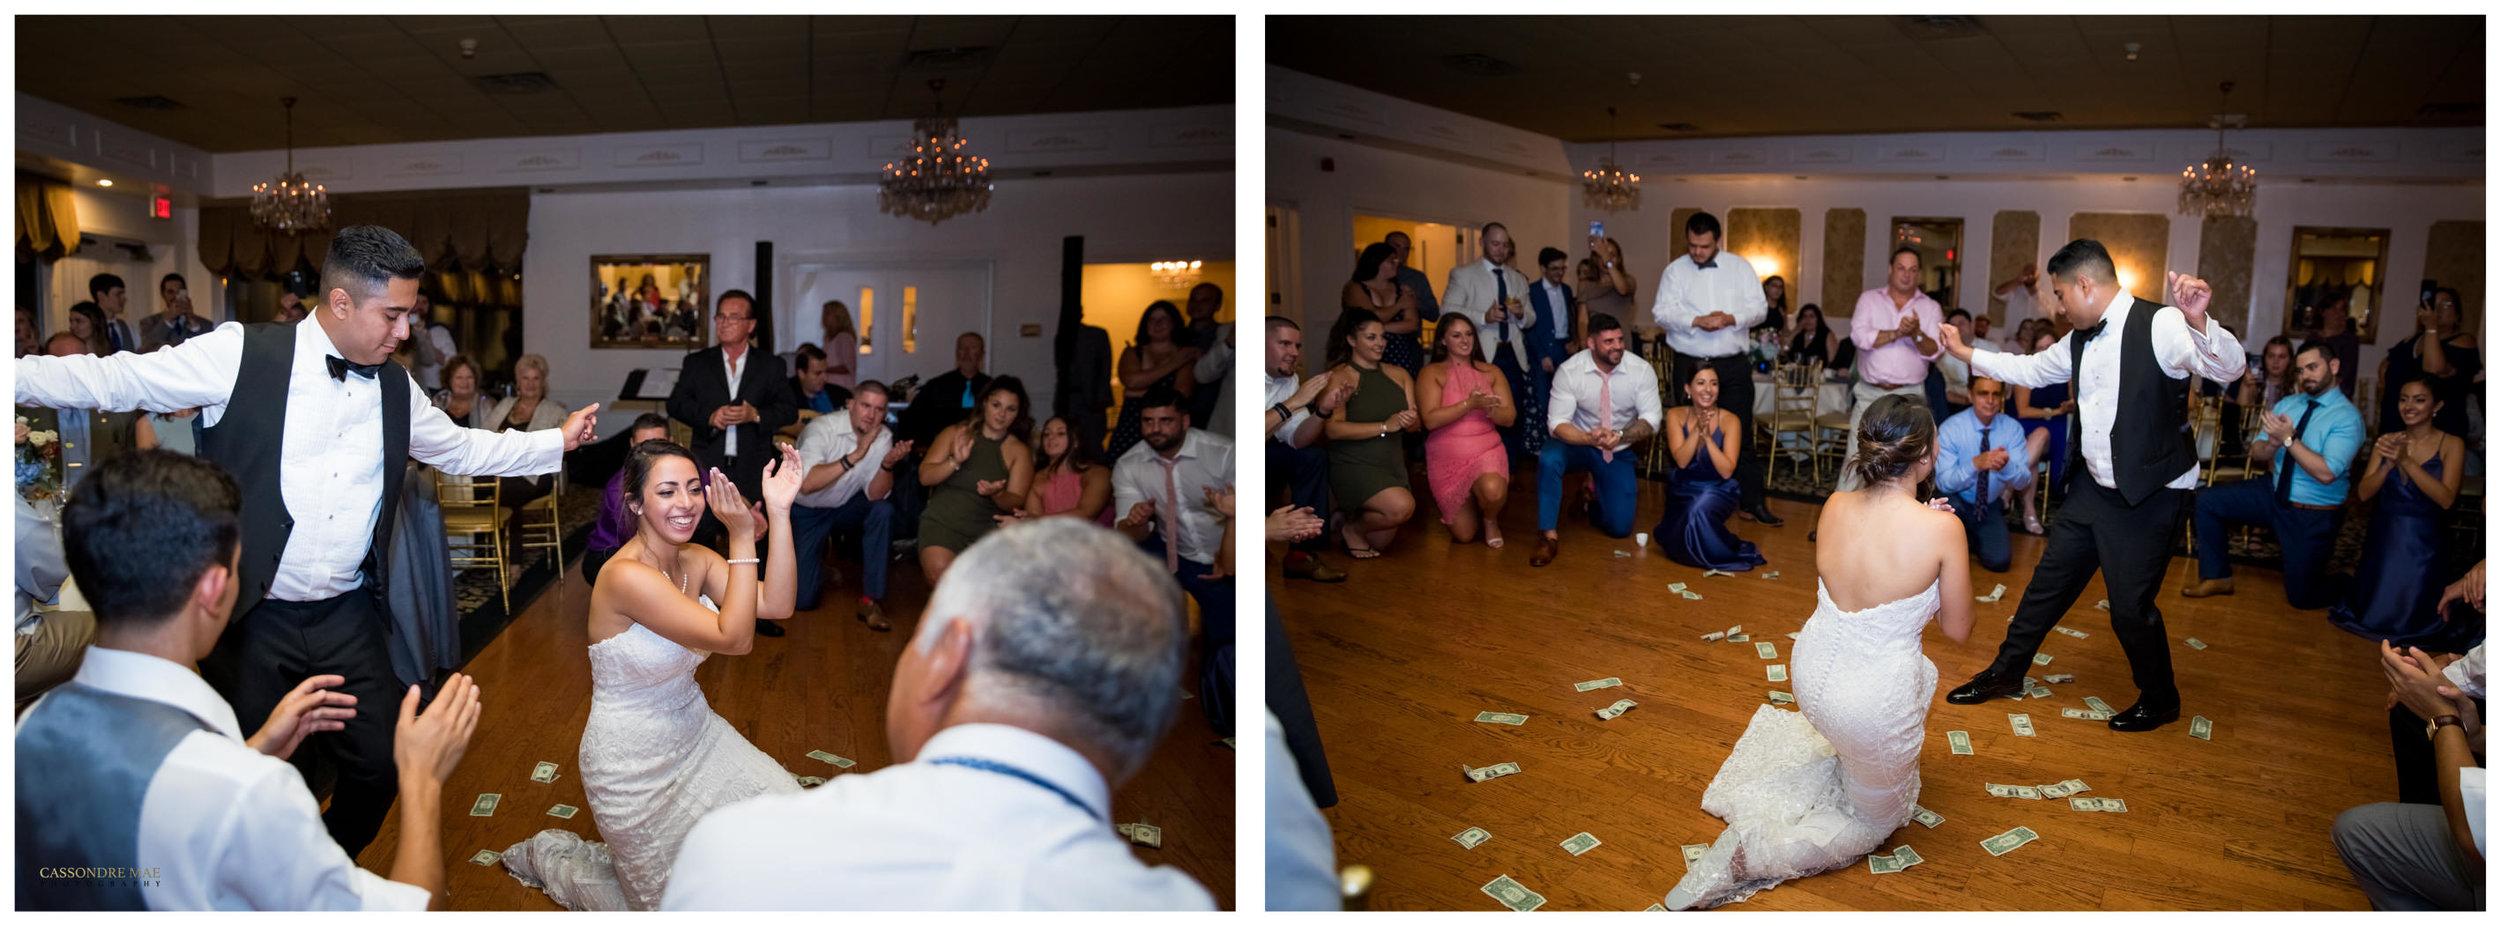 Cassondre Mae Photography Hudson Valley Wedding Photographer